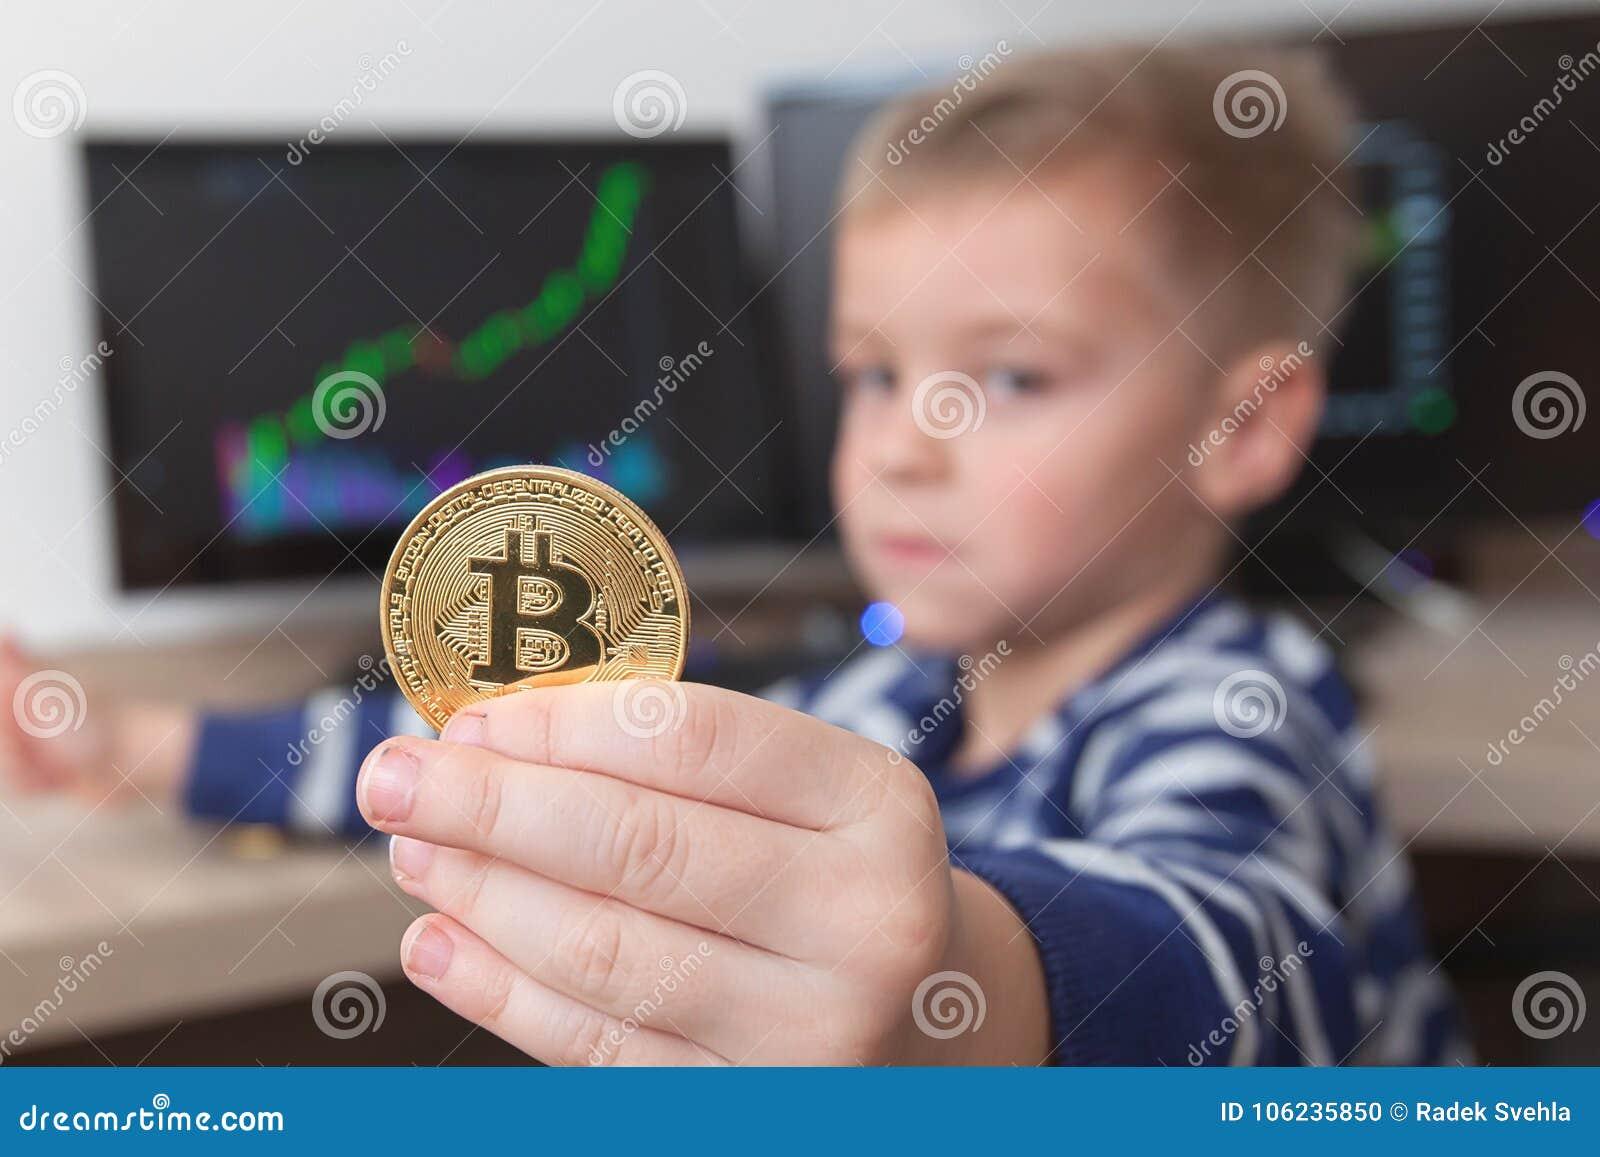 Gold Bitcoin coin stock photo  Image of golden, businessman